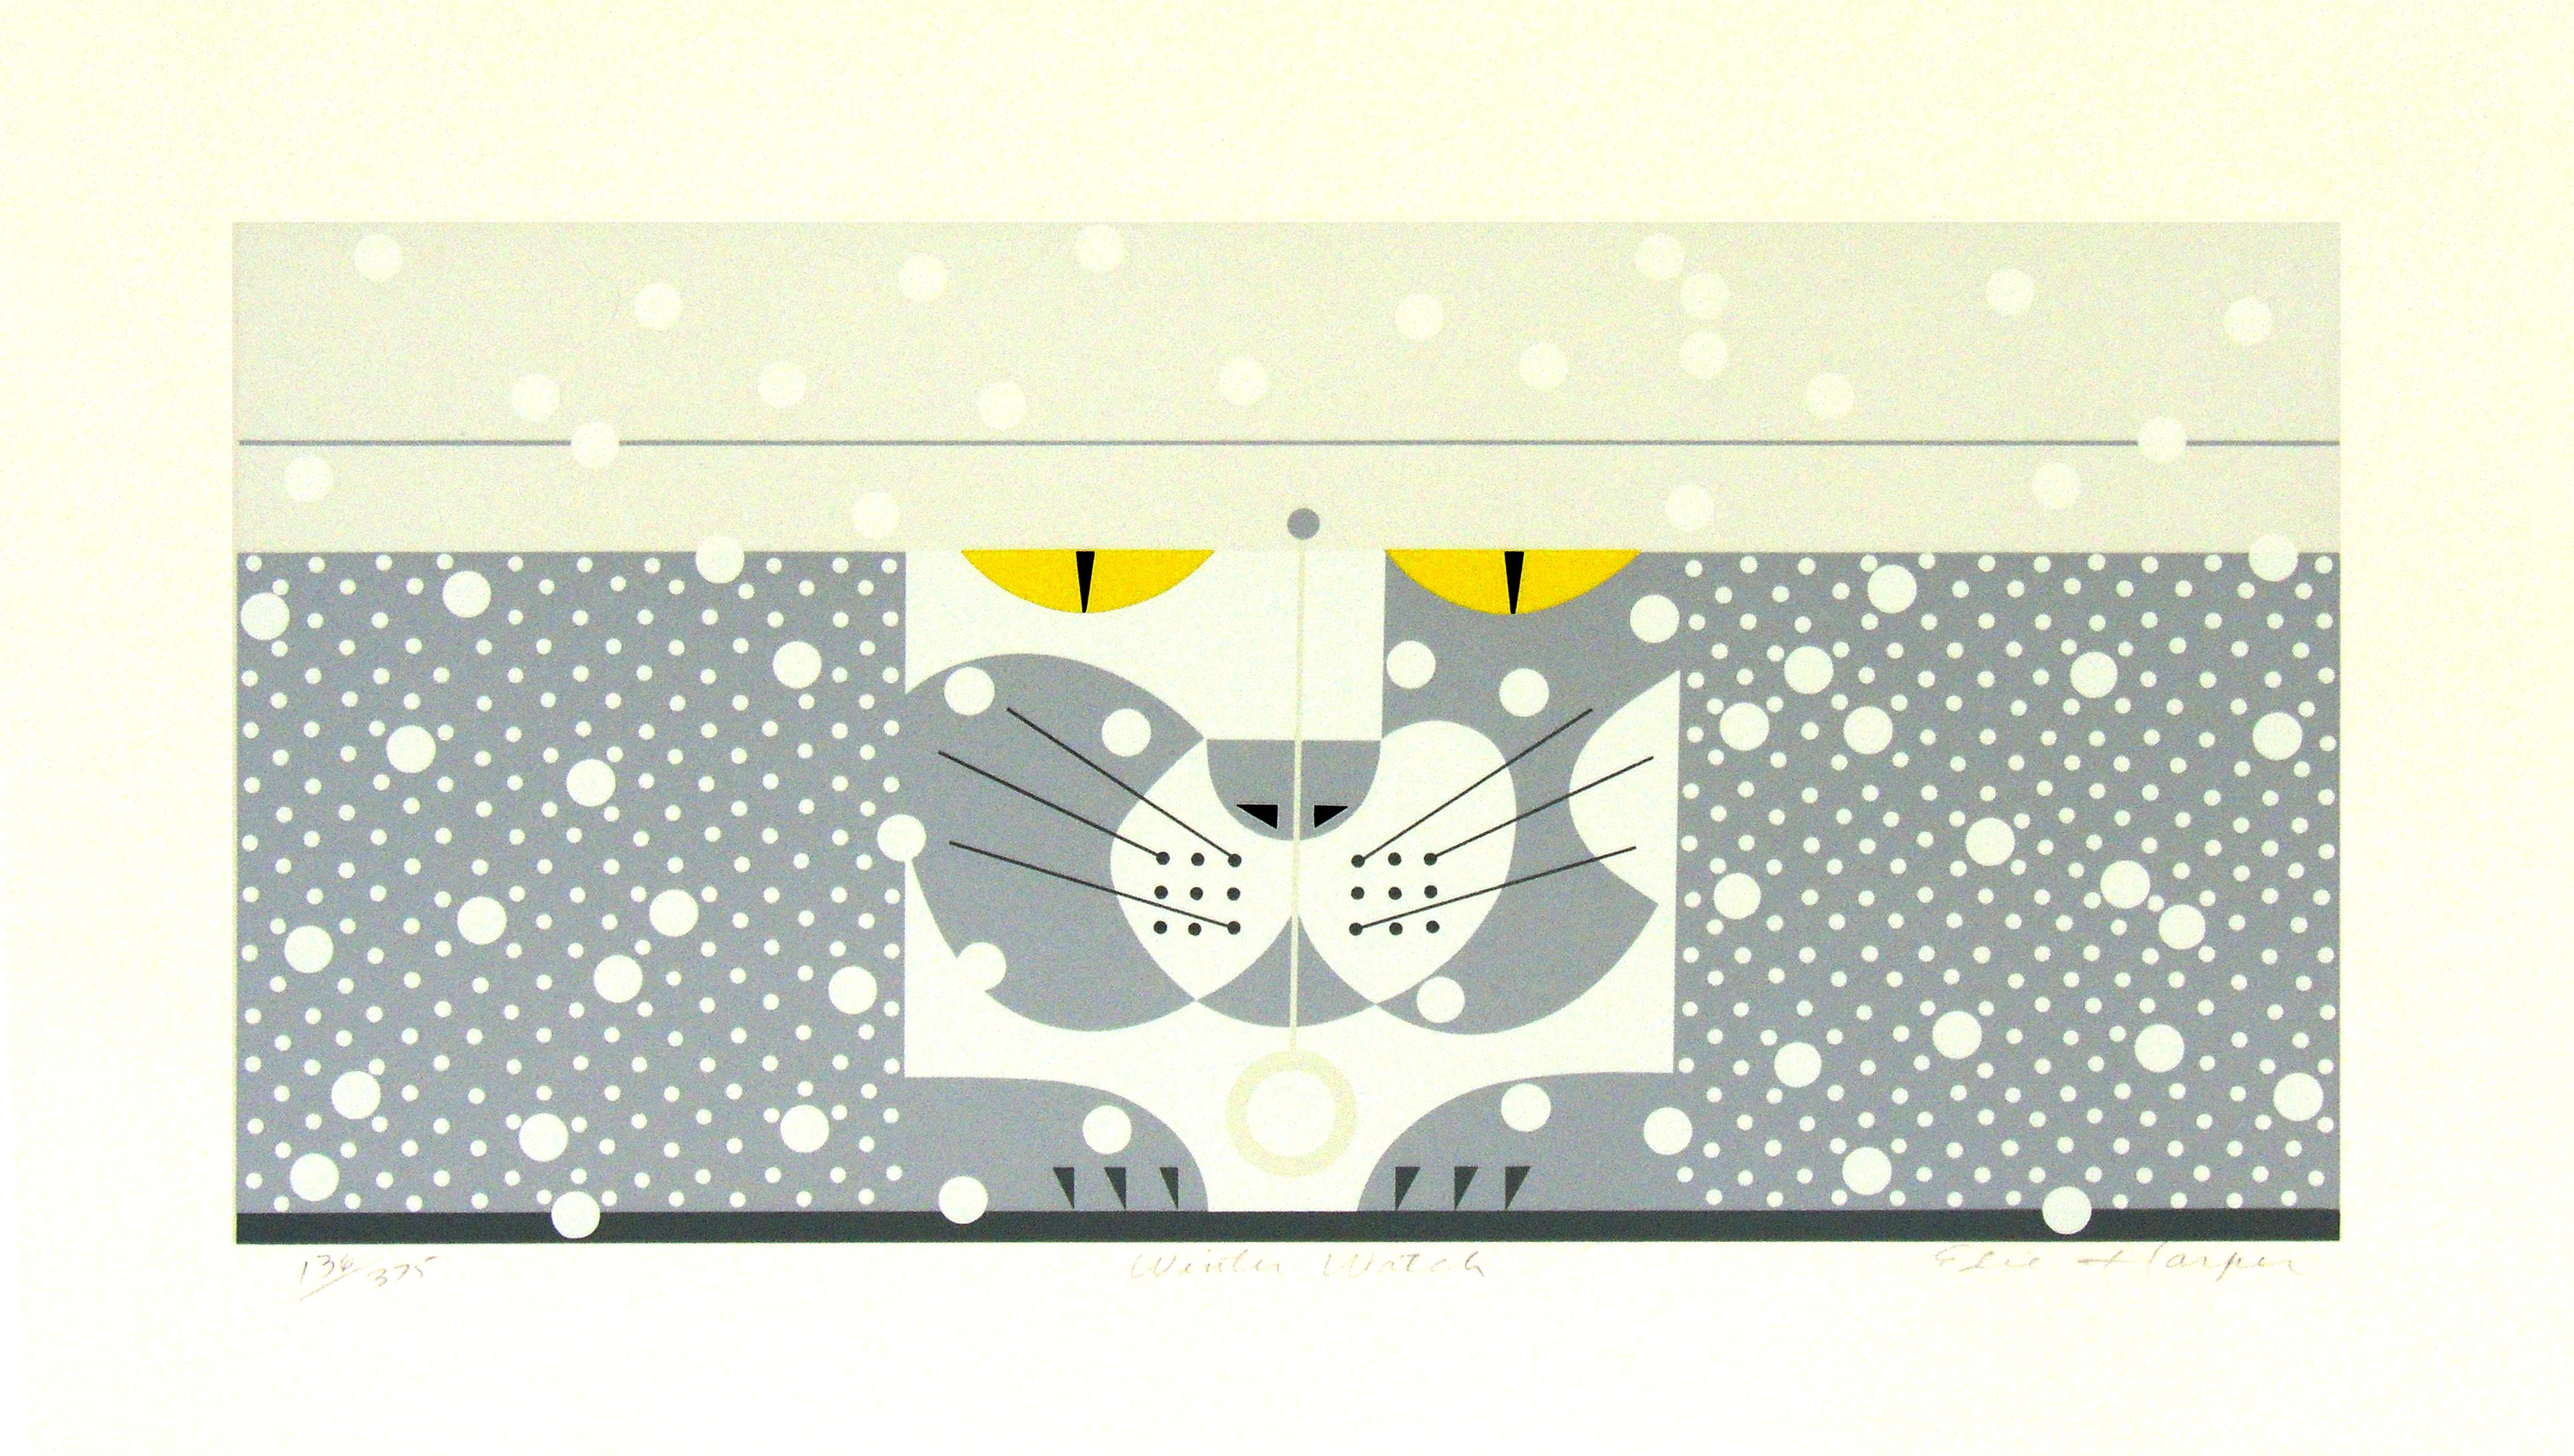 Edie Harper | WINTER WATCH | serigraph on paper | 12 x 20